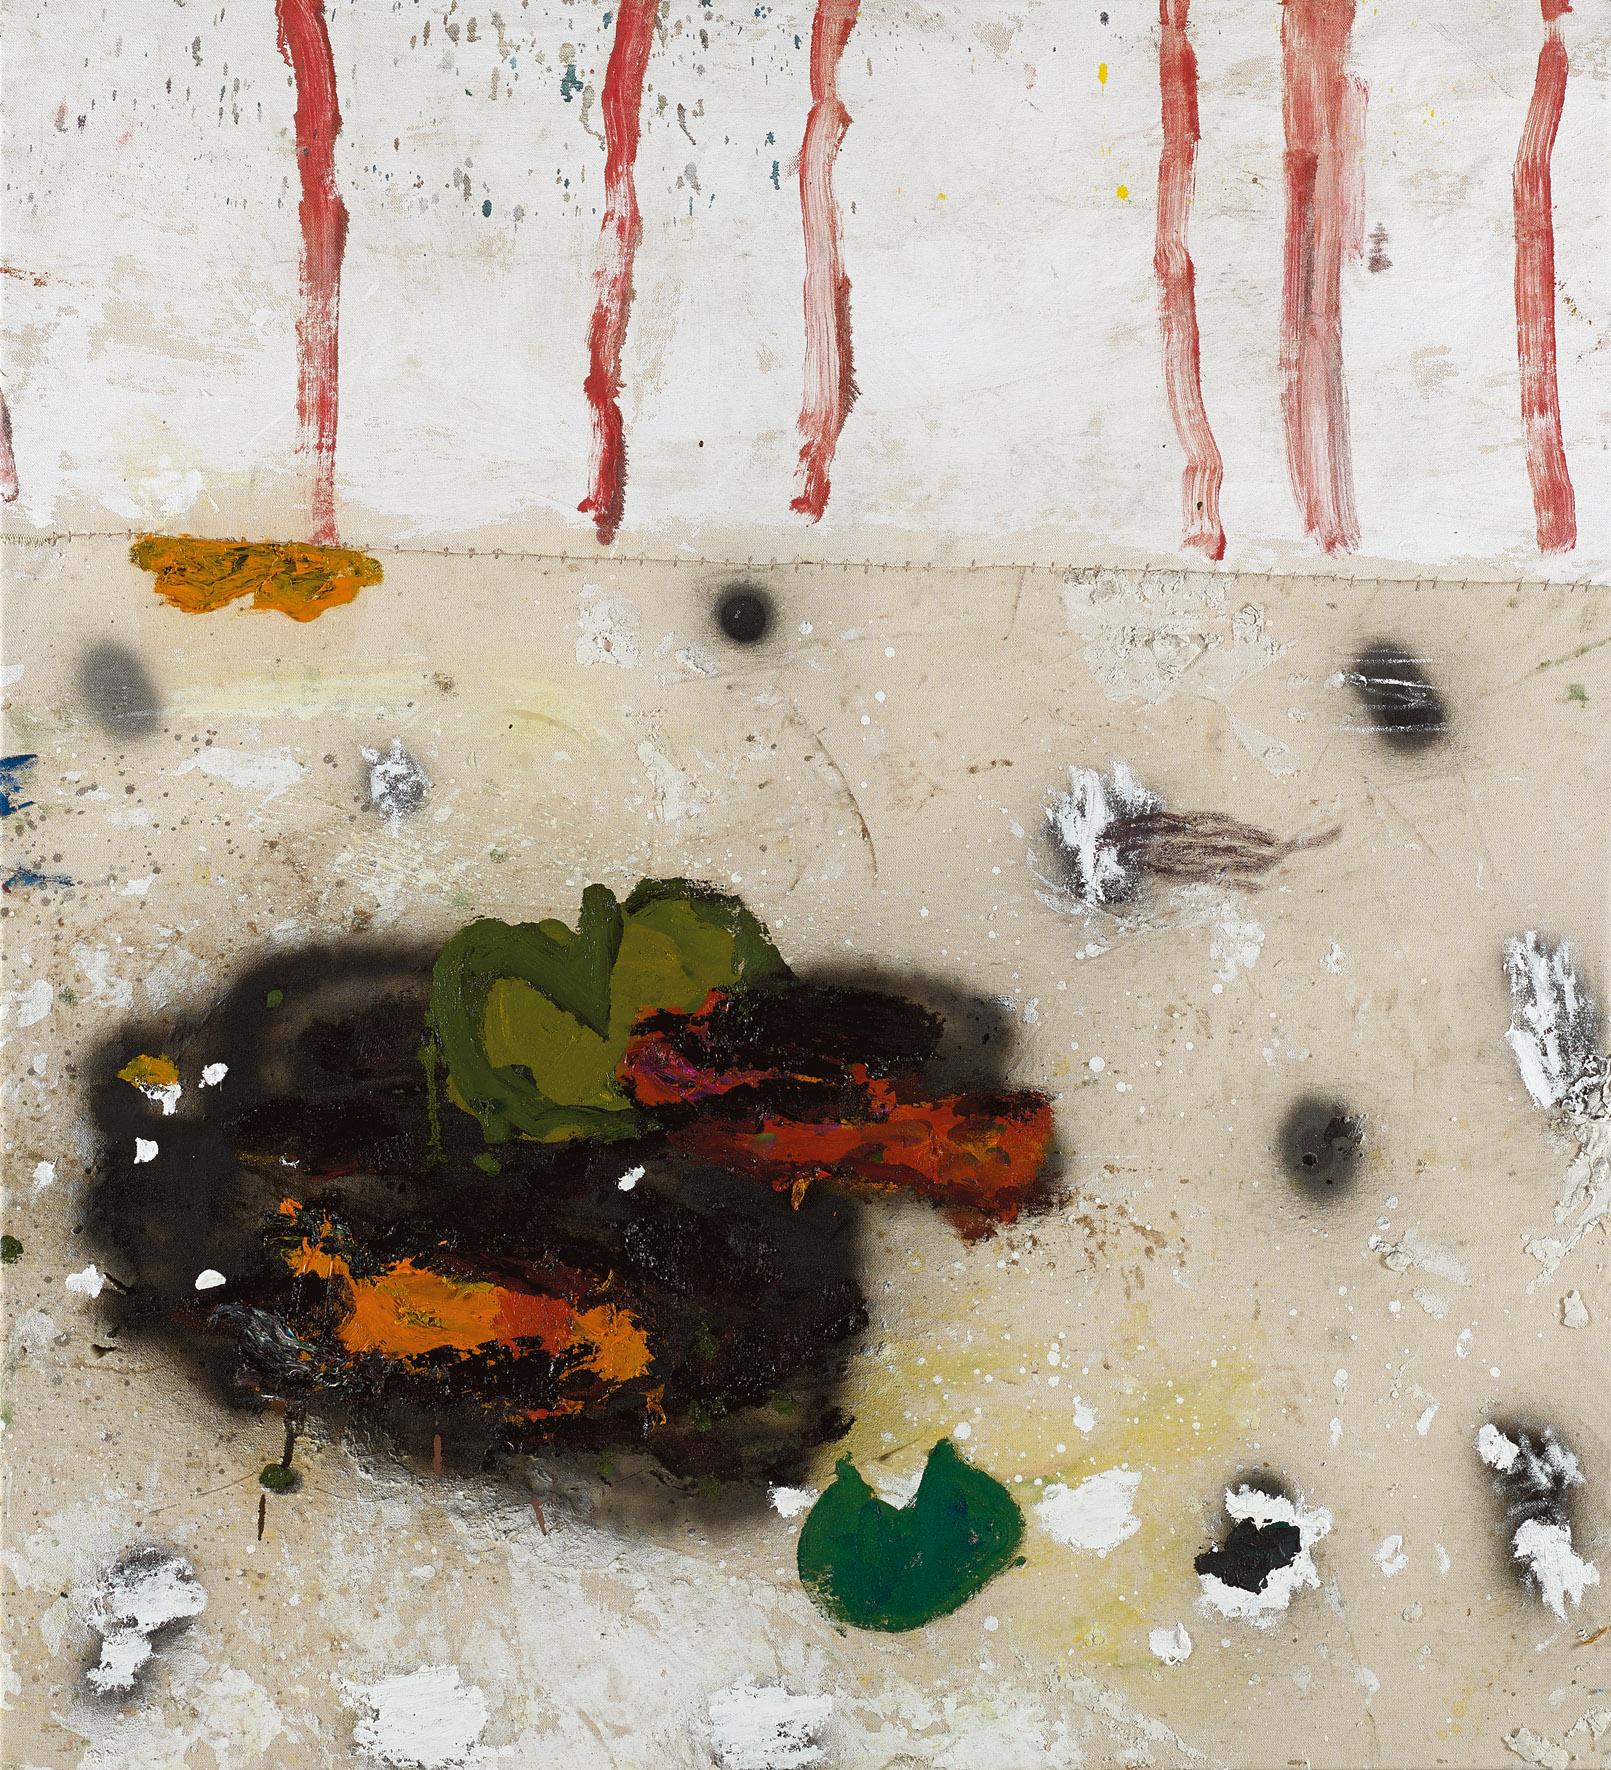 Amit Cabessa, 2019, Mixed media on canvas 110 x 100 cm